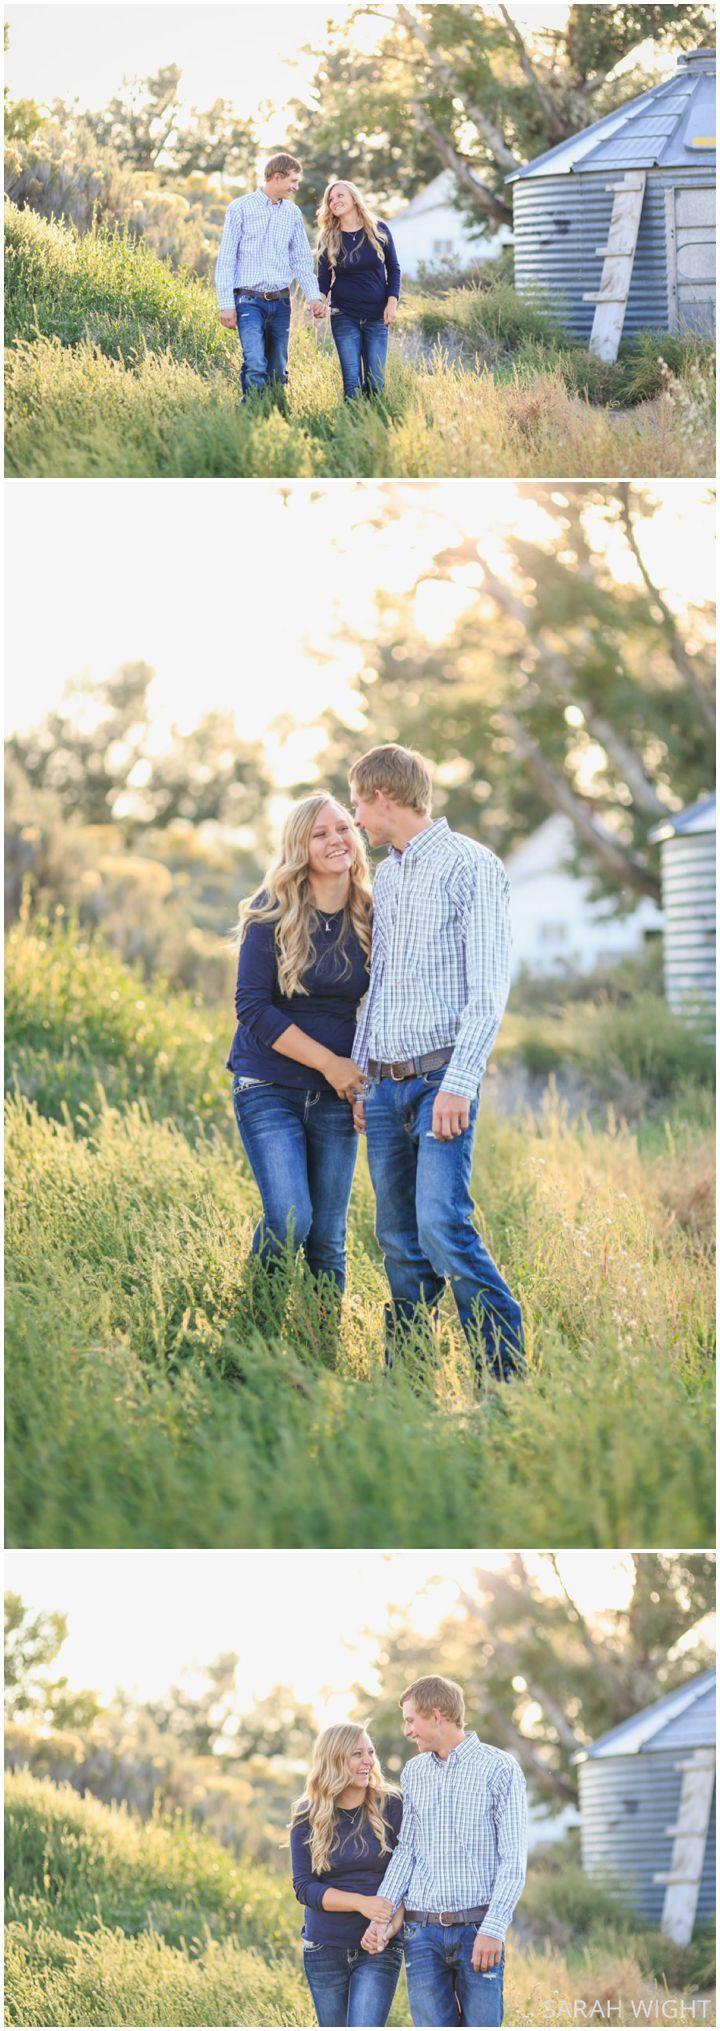 Idaho Country Farm Engagement Photographer_0009.jpg